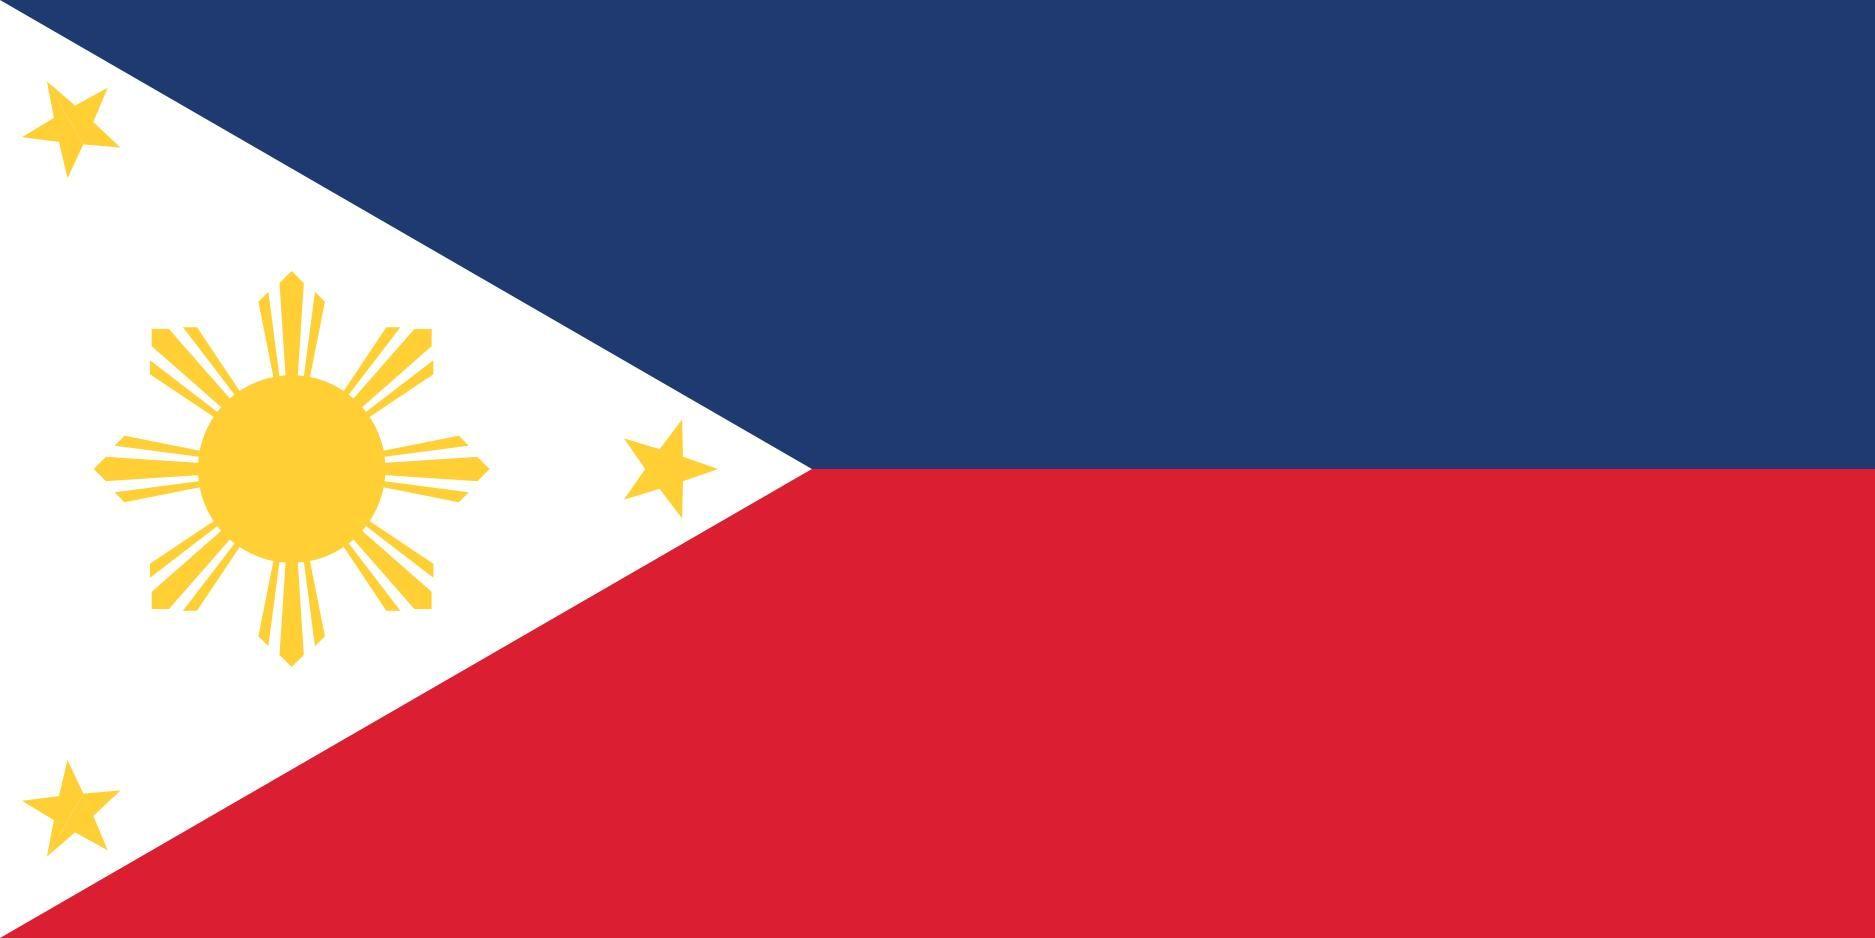 Philippines Flag And Emblem Filipino Tattoos Philippine Flag Filipino Tribal Tattoos